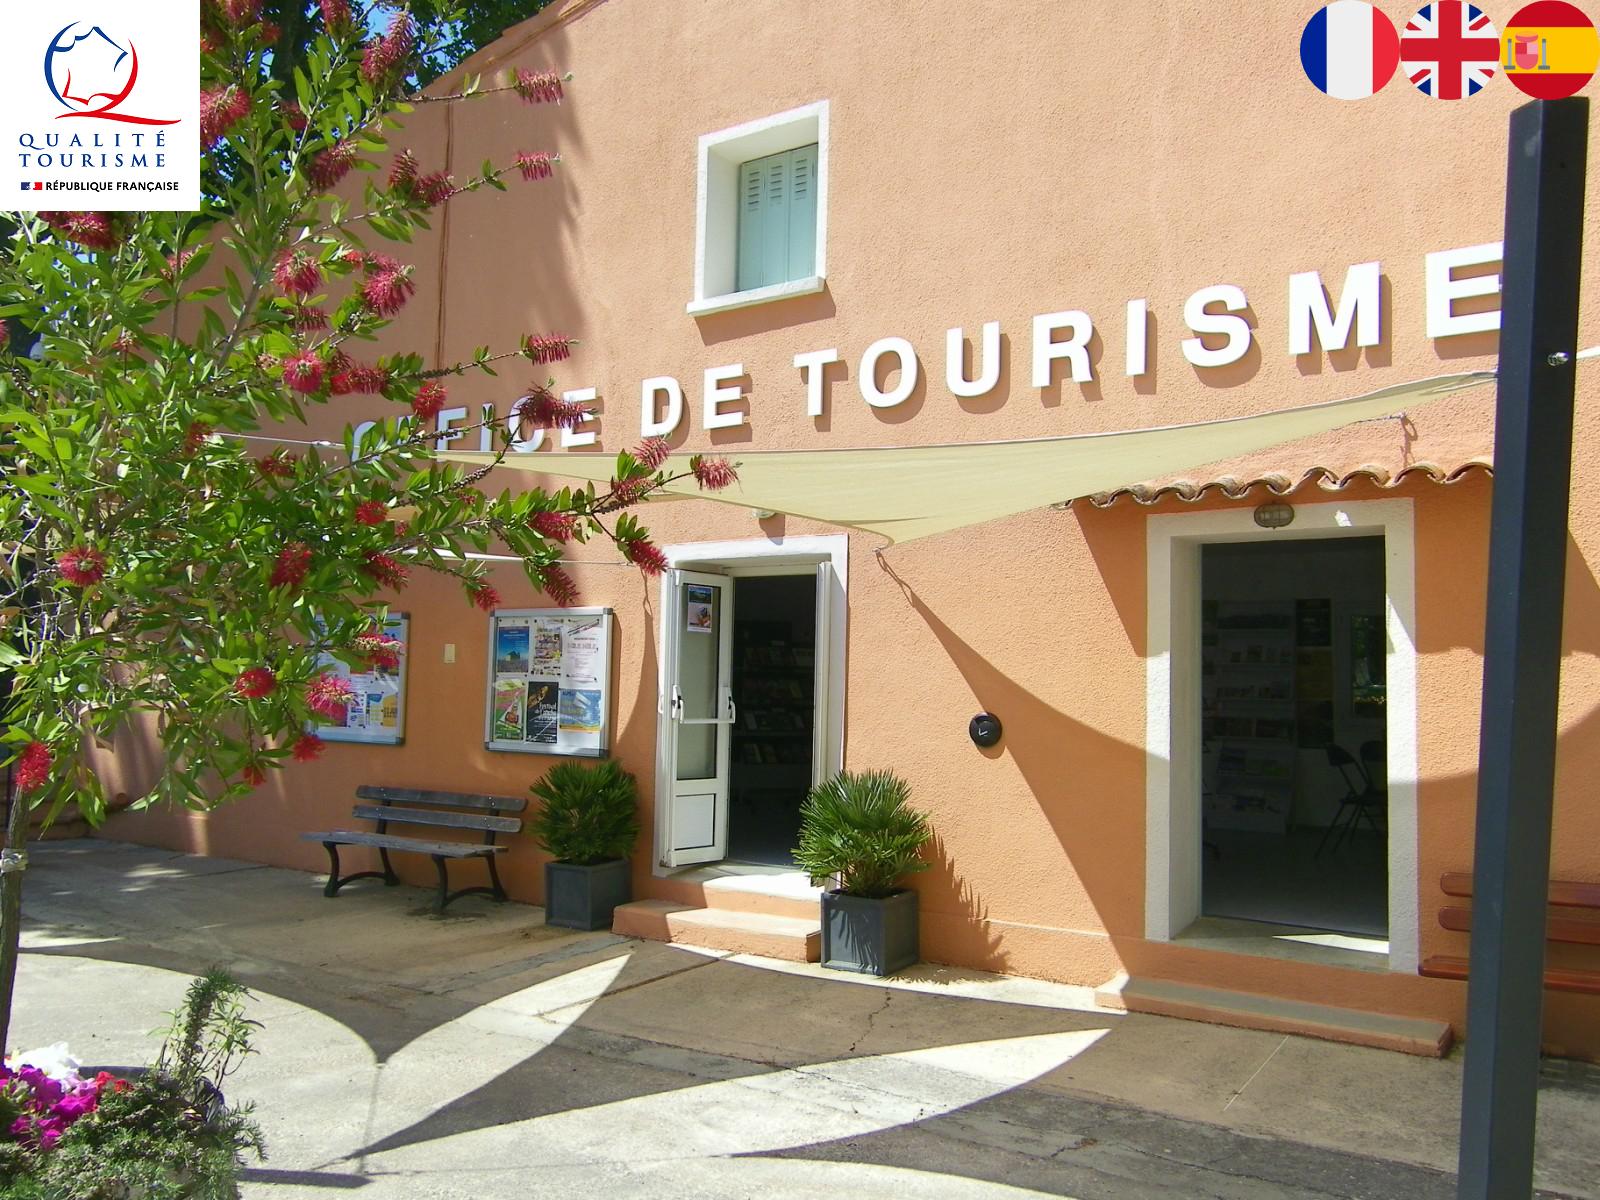 Photo Villecroze Tourisme